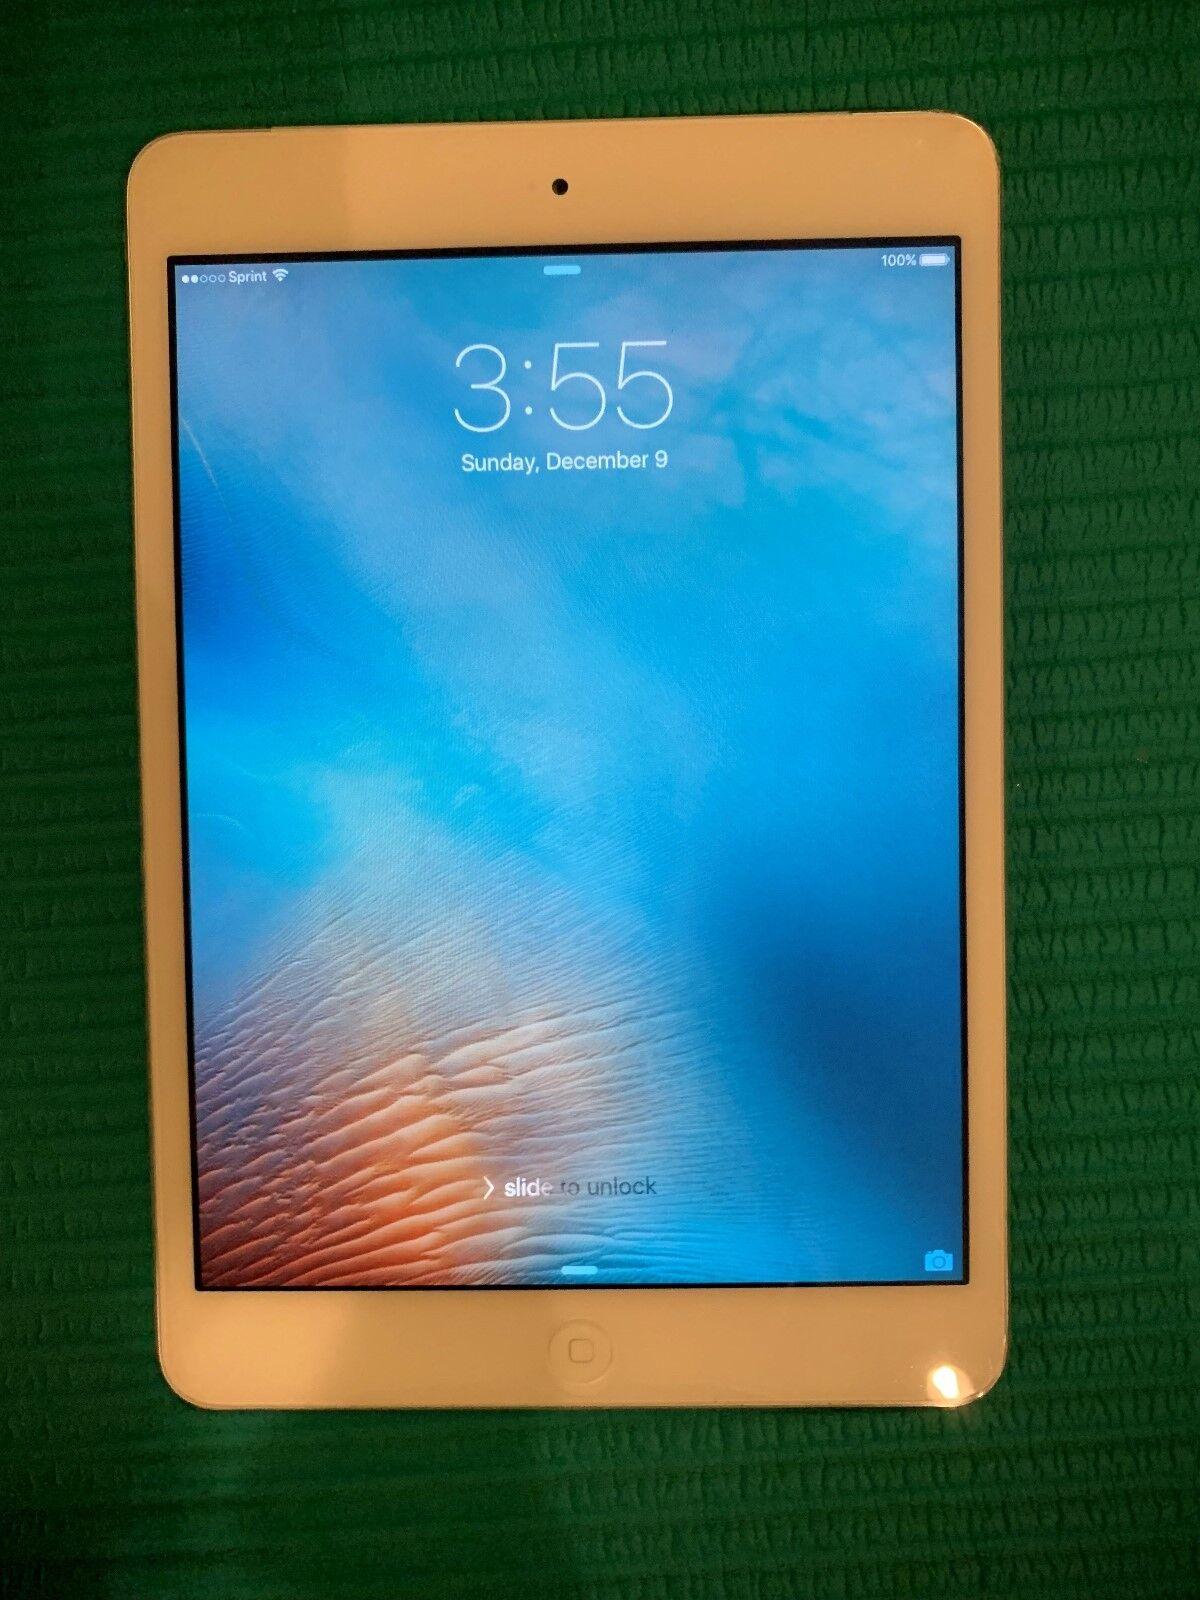 Apple iPad mini 1st Gen. 16GB, Wi-Fi + Cellular (Sprint), 7.9in - White & Silver